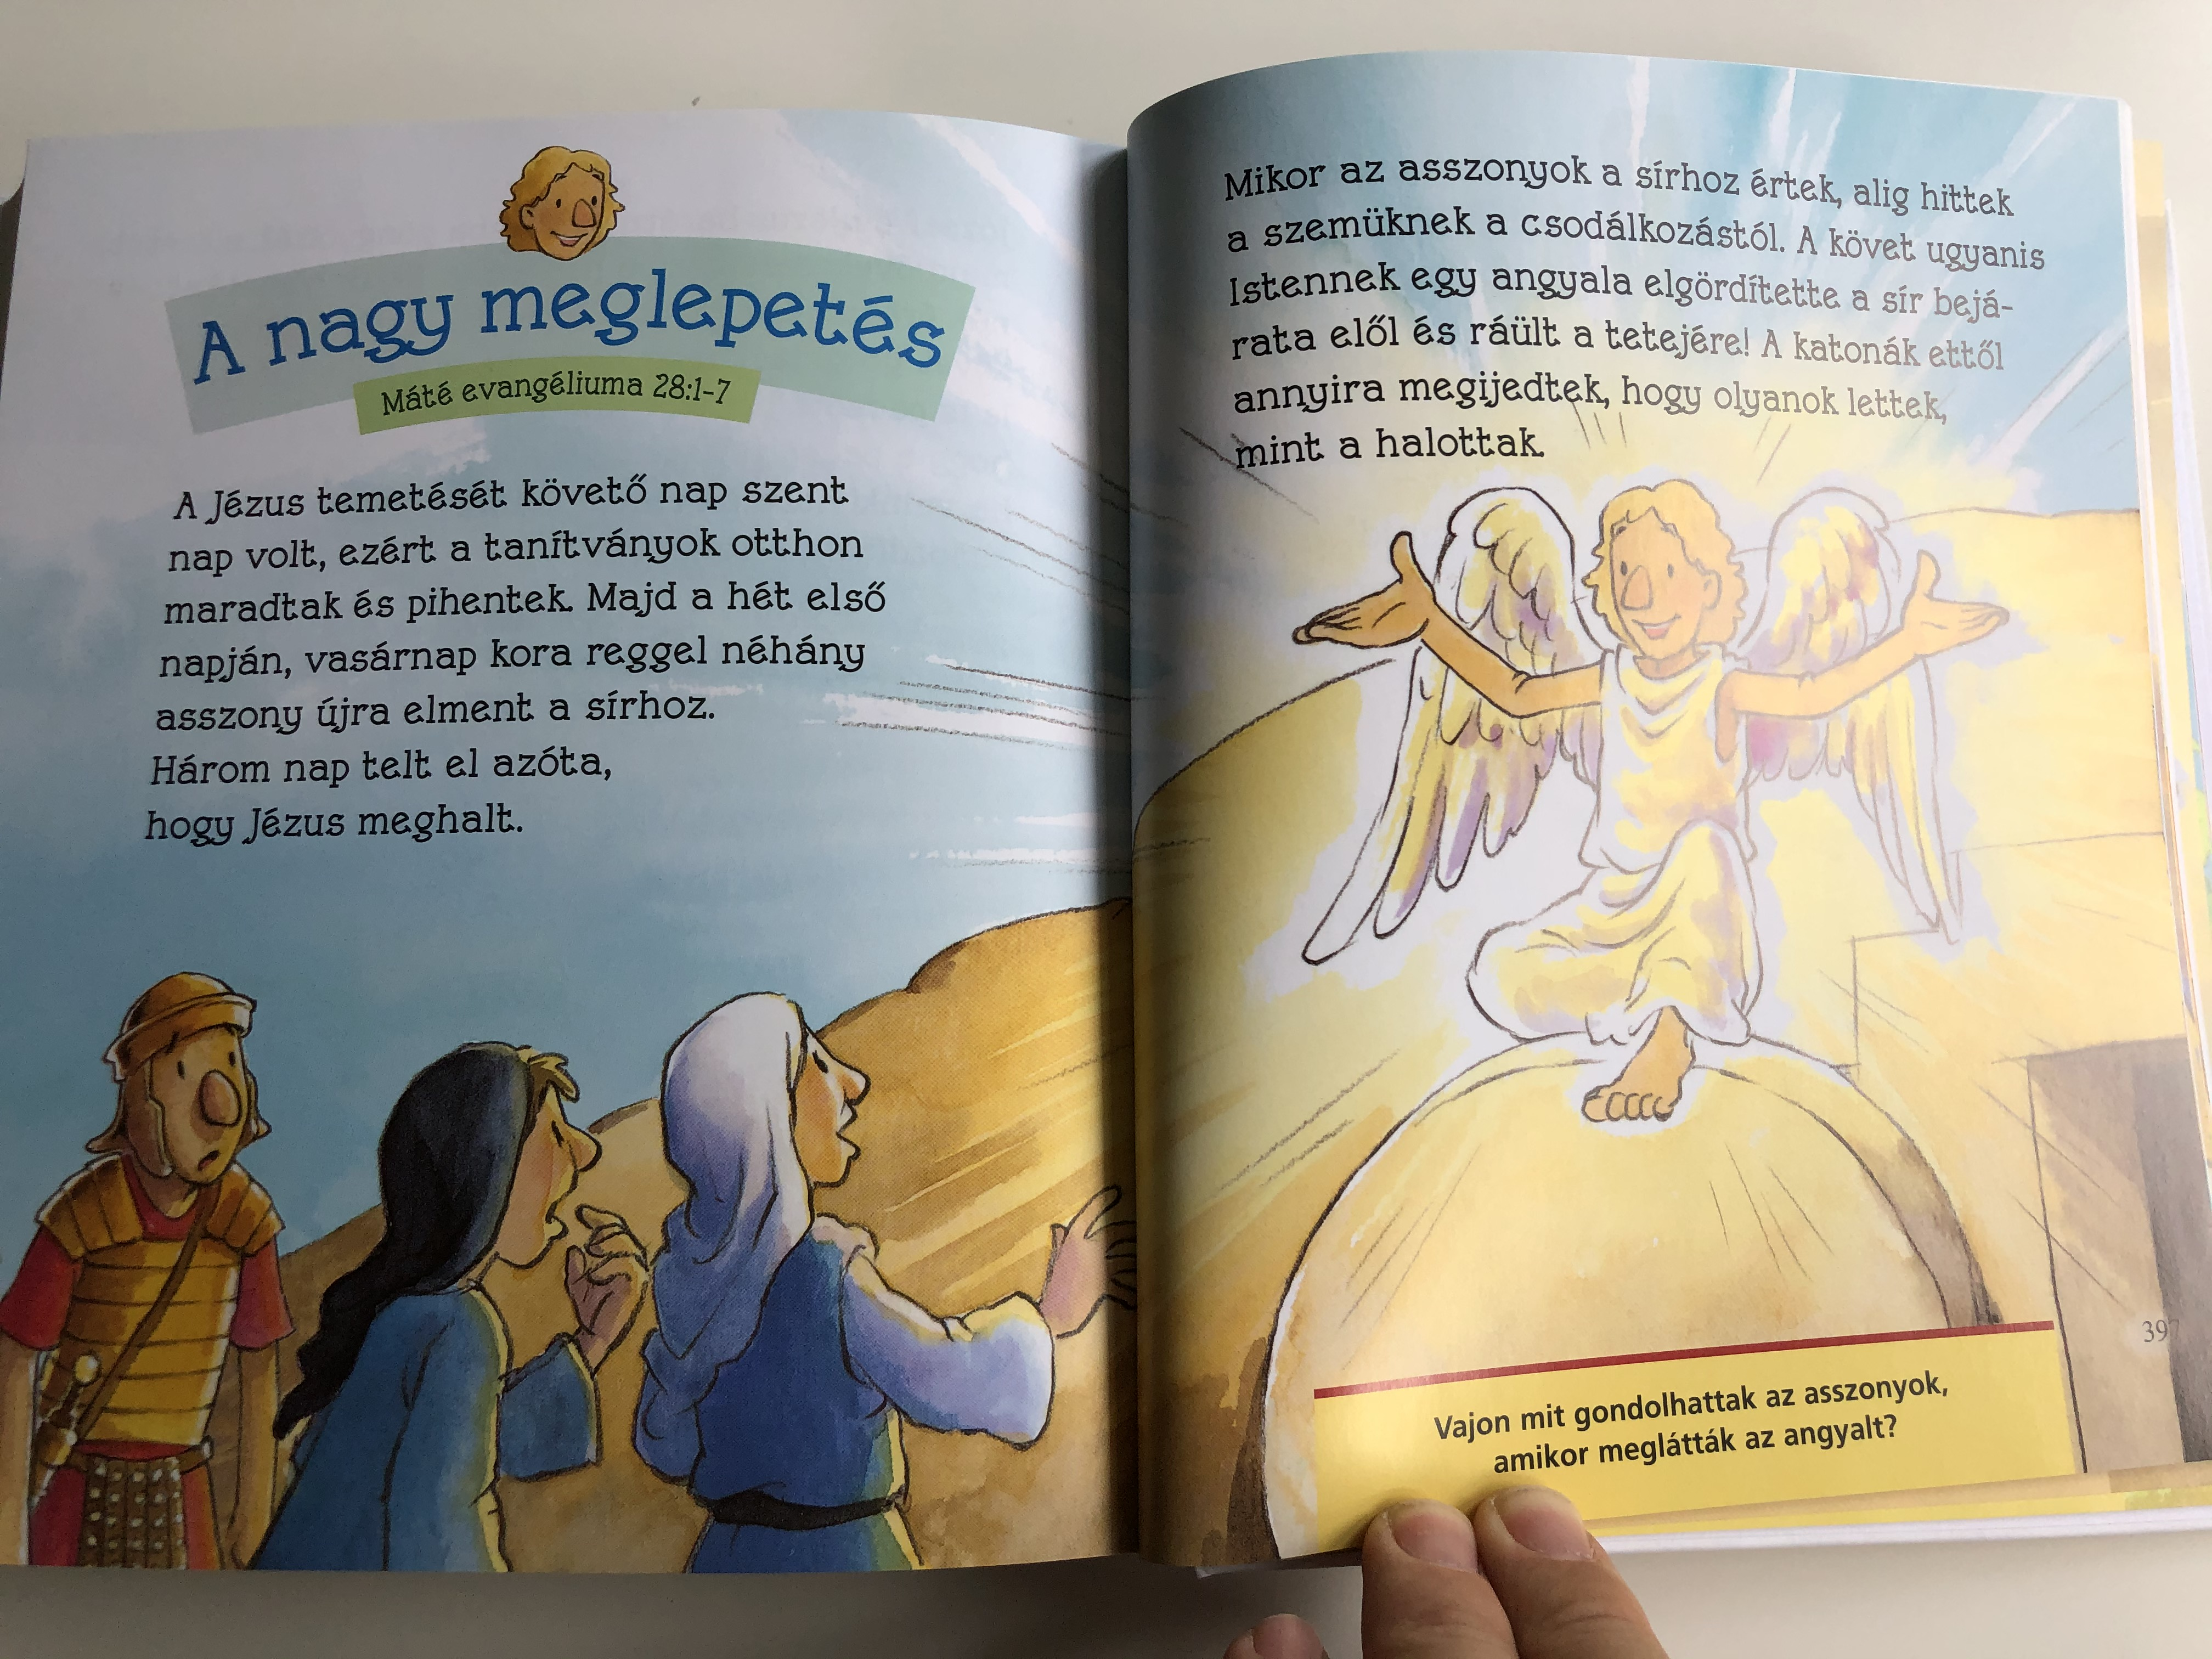 gyerekek-bibli-ja-hungarian-edition-of-read-share-bible-by-gwen-ellis-18.jpg